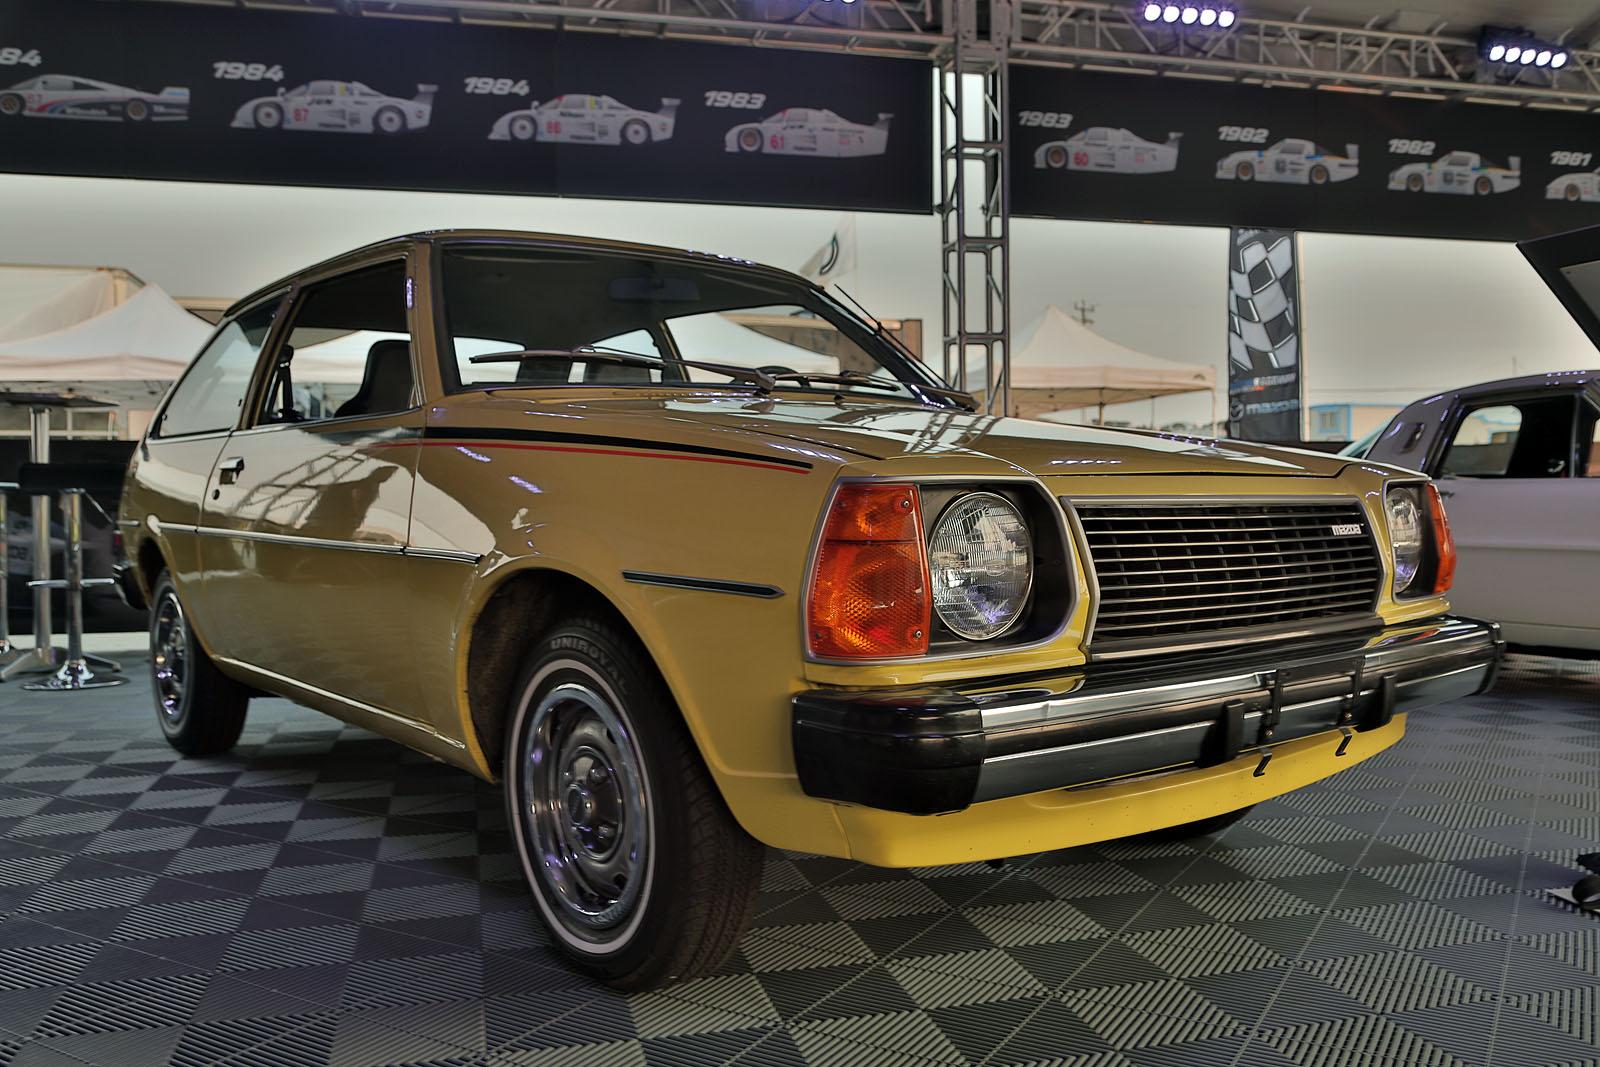 Mazda-at-Monterey-Motorsports-Reunion-14